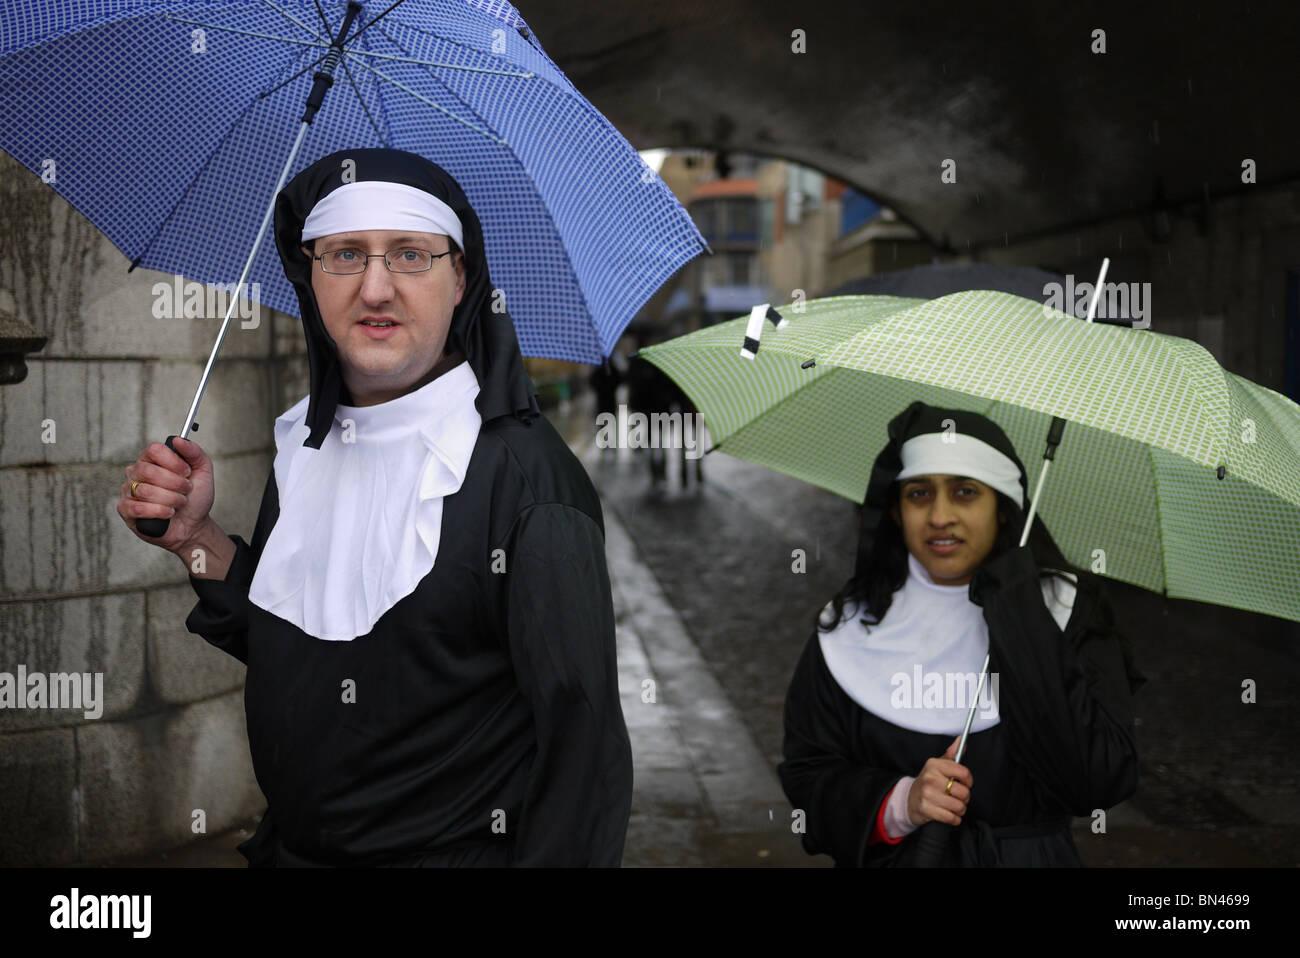 Nuns on the Run charity run in London england UK - Stock Image